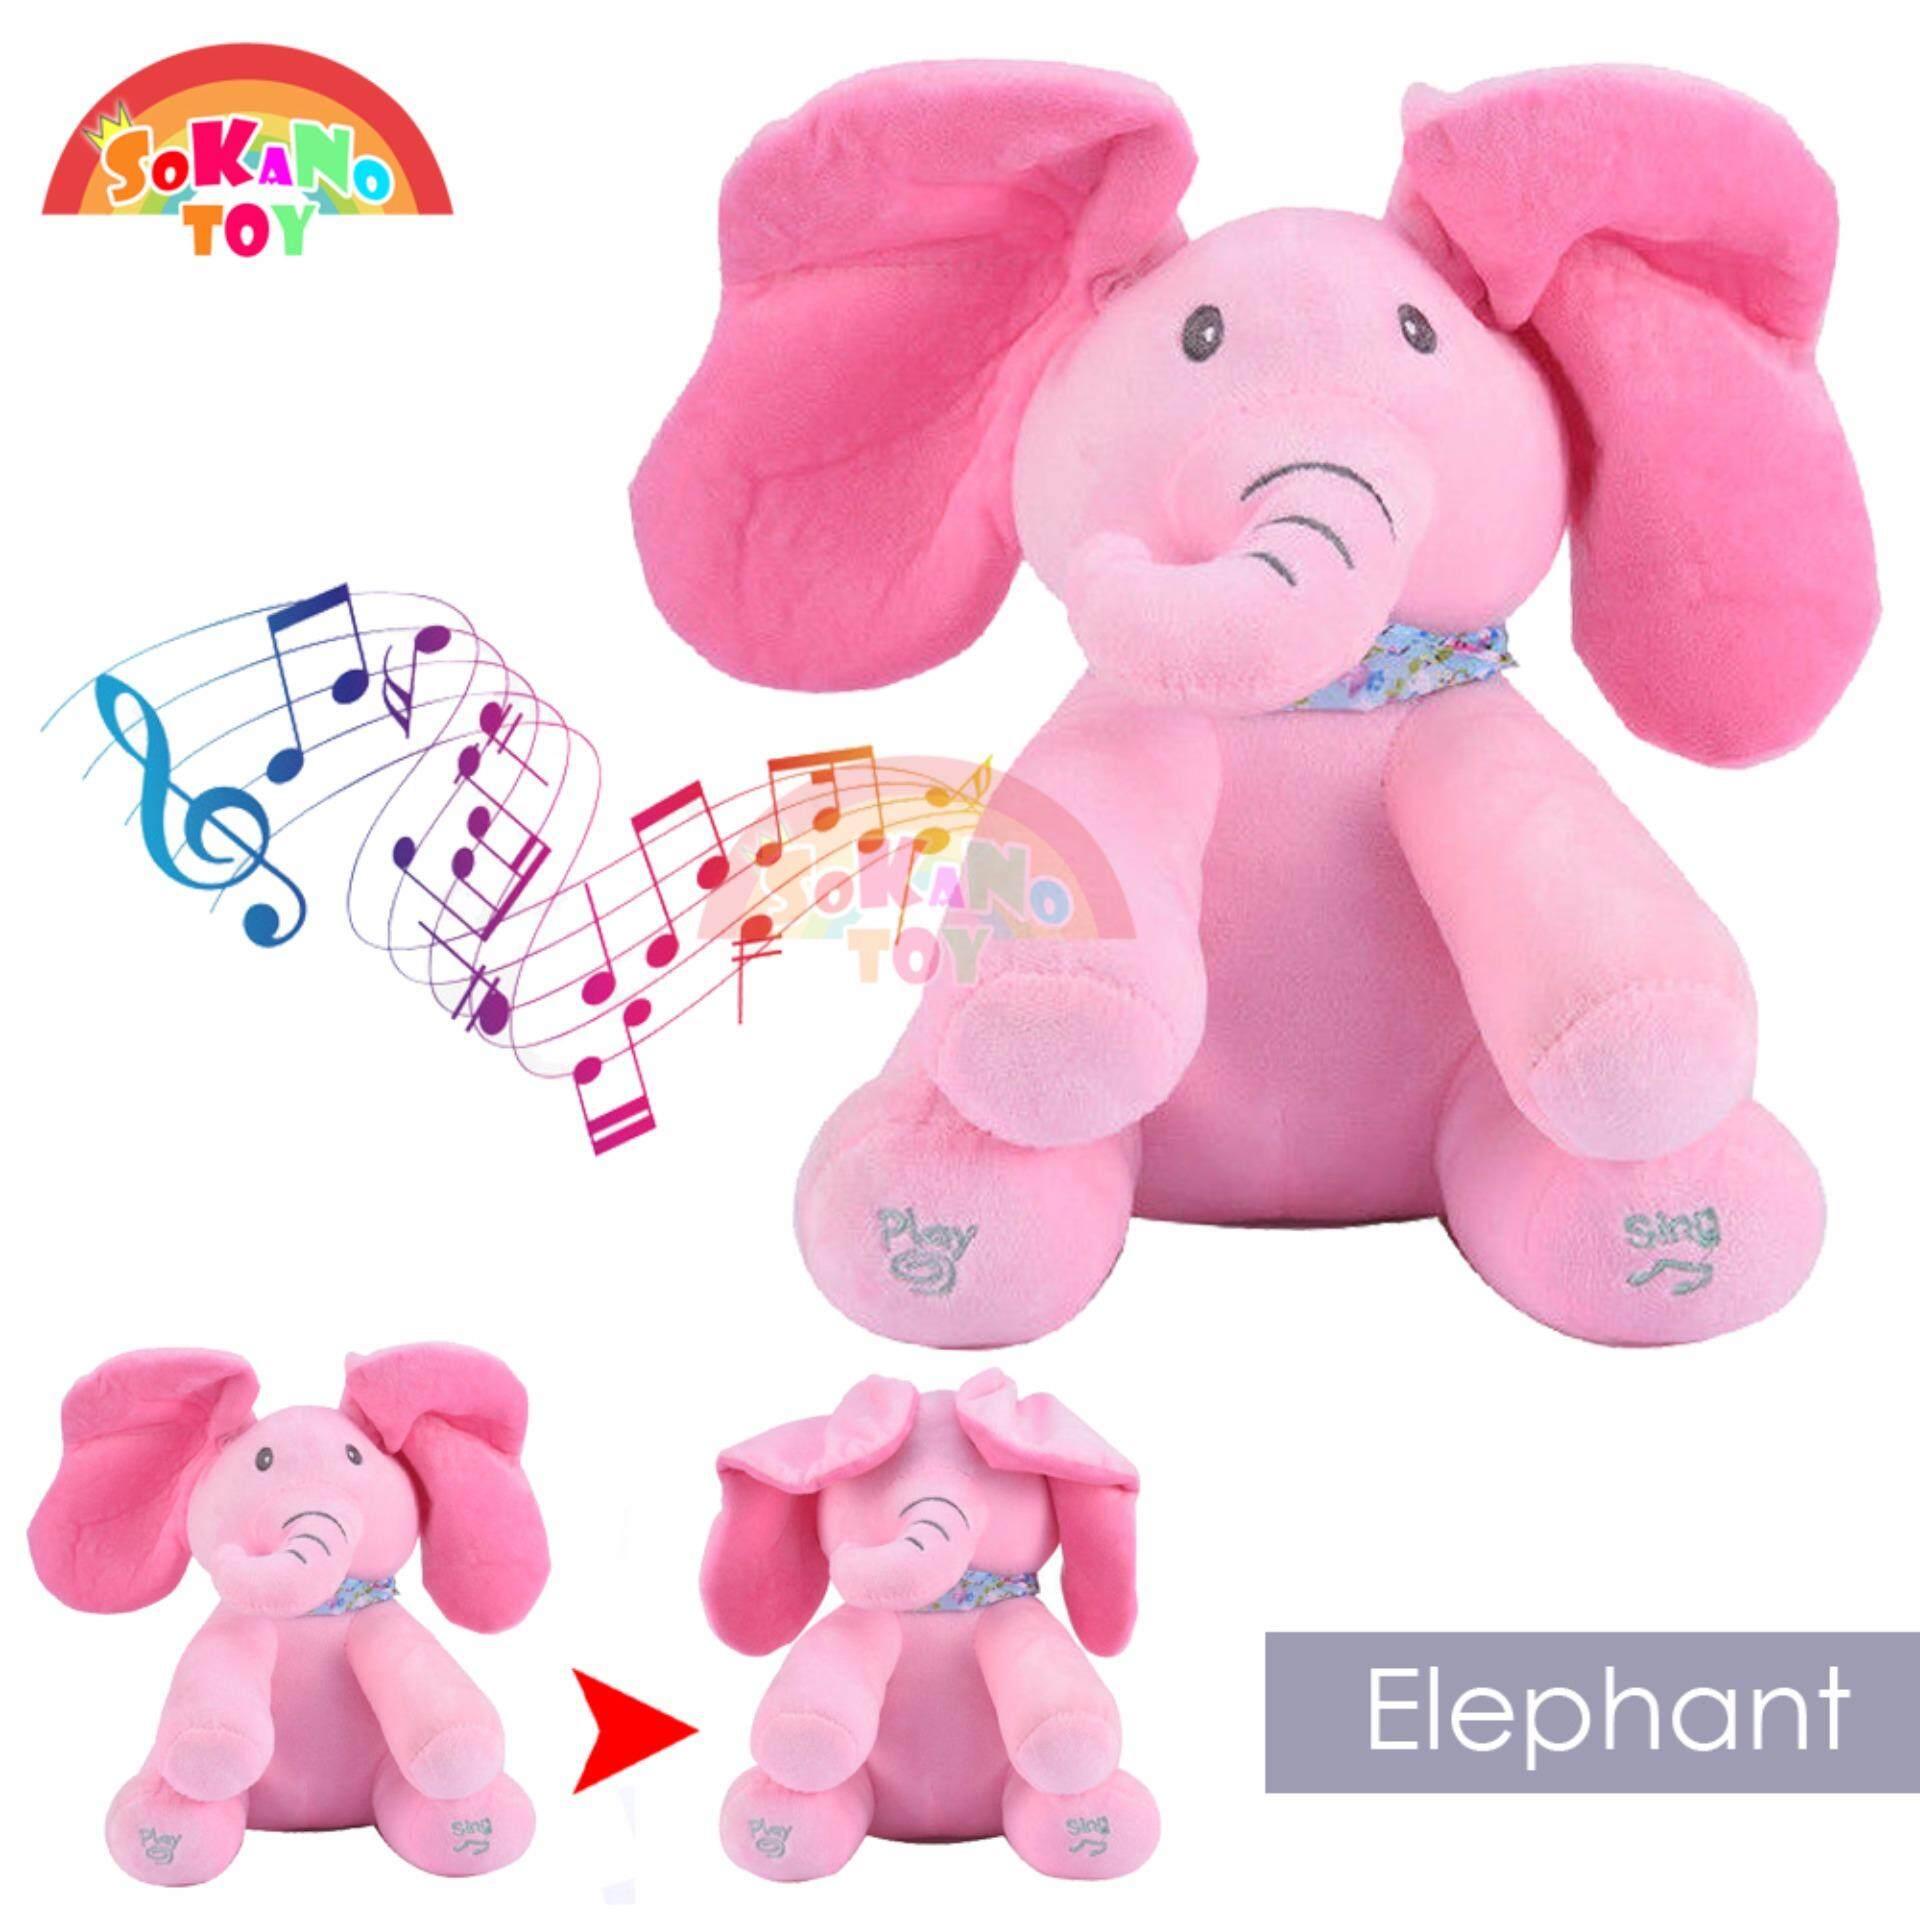 SOKANO TOY Animated Sing & Play Elephant Plush Kids Interactive Fun Toy - Pink